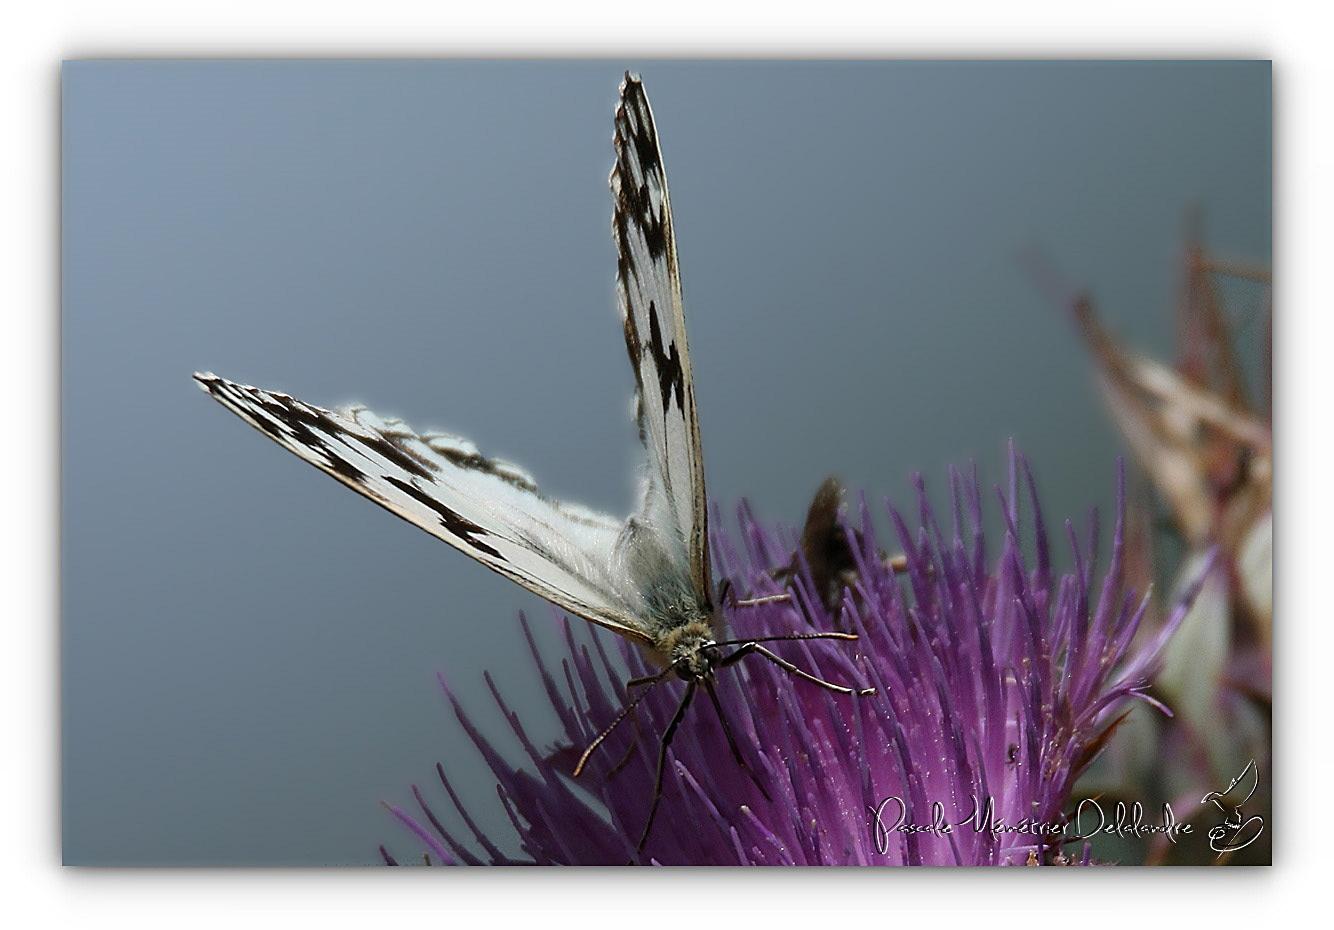 Dans la famille Nymphalidae